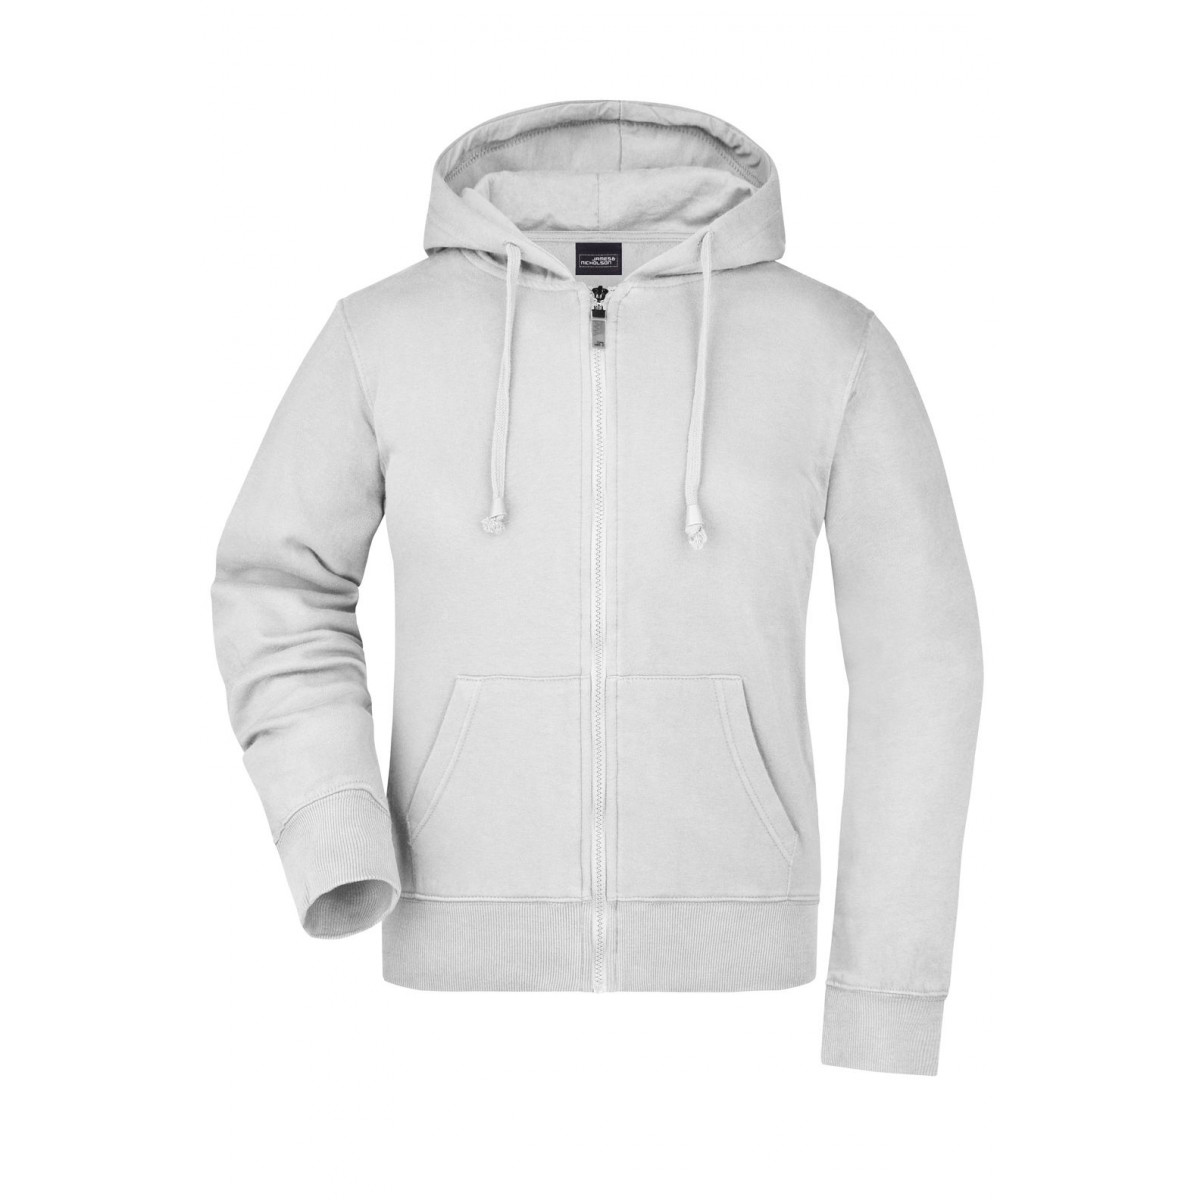 Толстовка женская JN053 Ladies Hooded Jacket - Белый